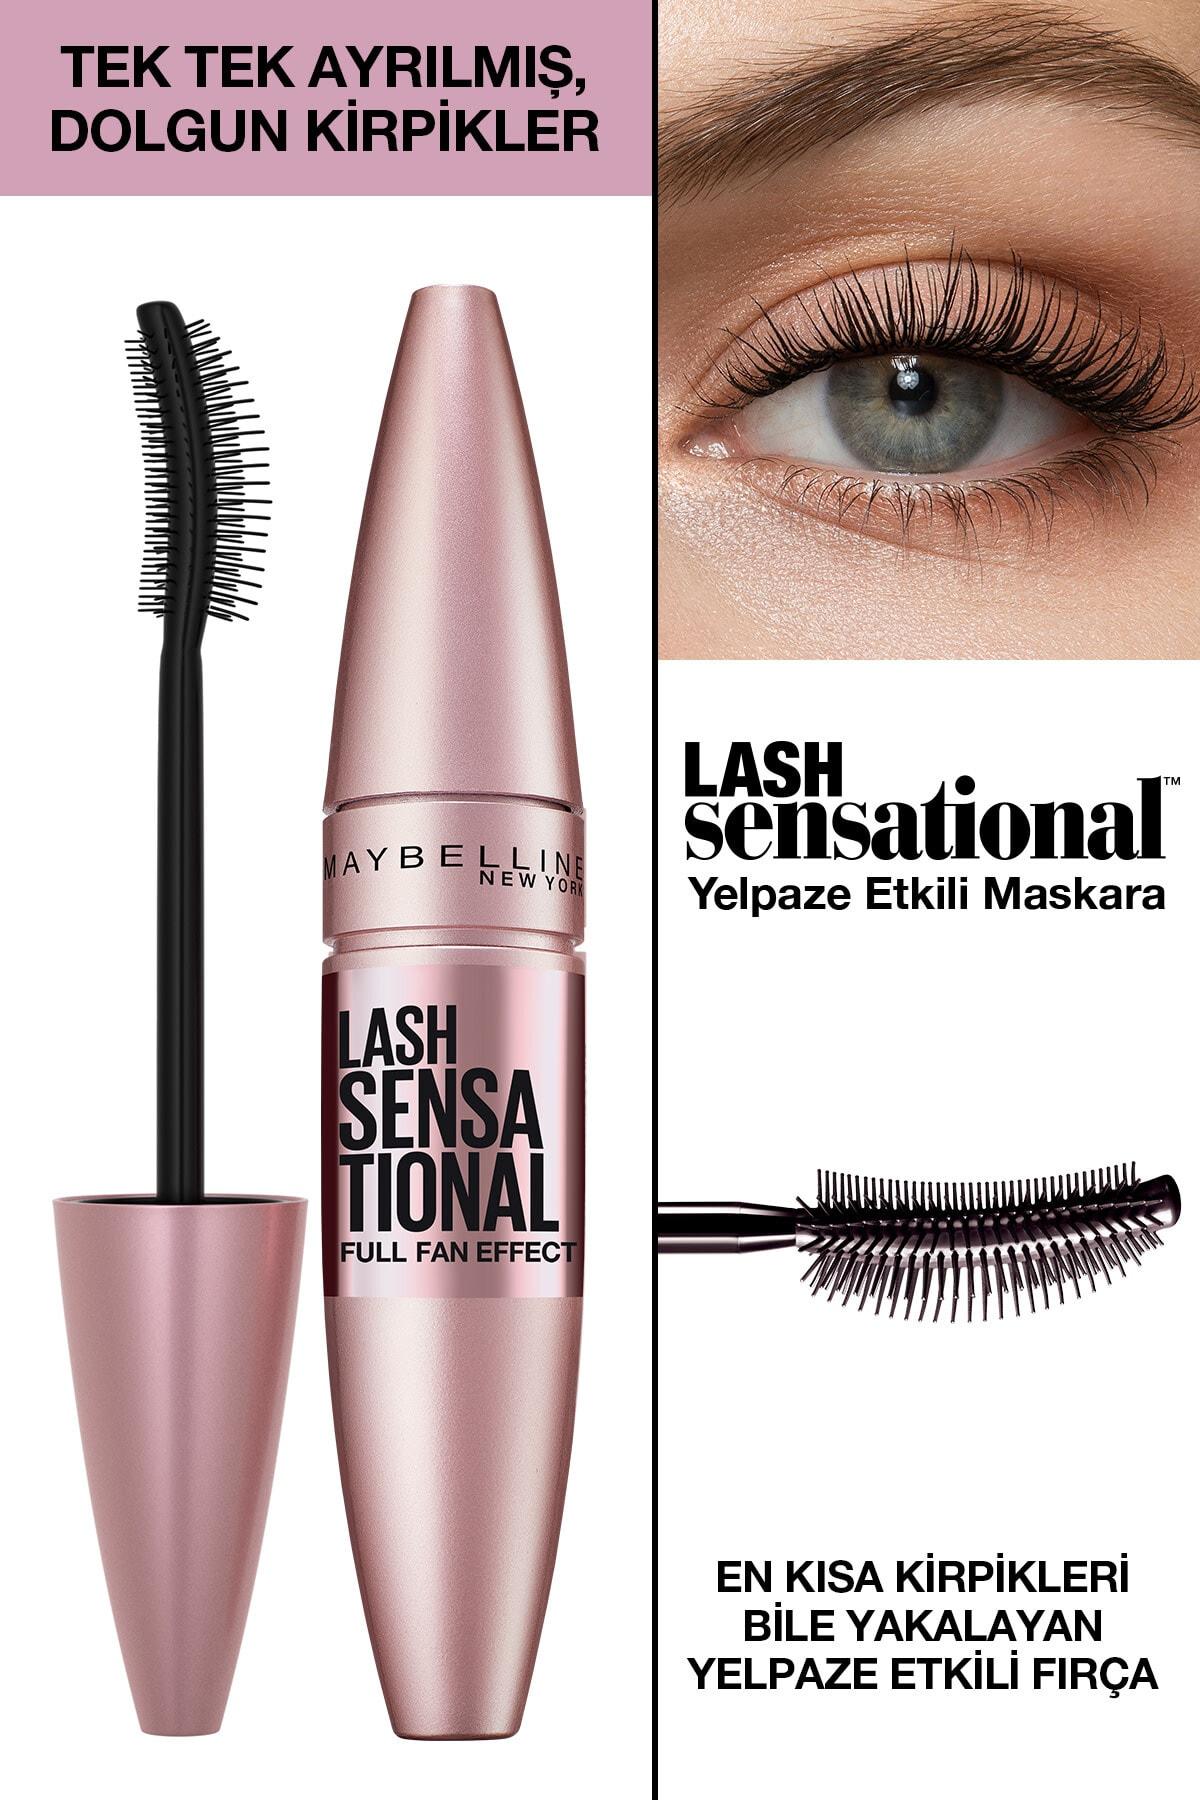 Maybelline New York Kıvrım & Hacim Etkili Siyah Maskara - Lash Sensational Mascara 3600531143459 1